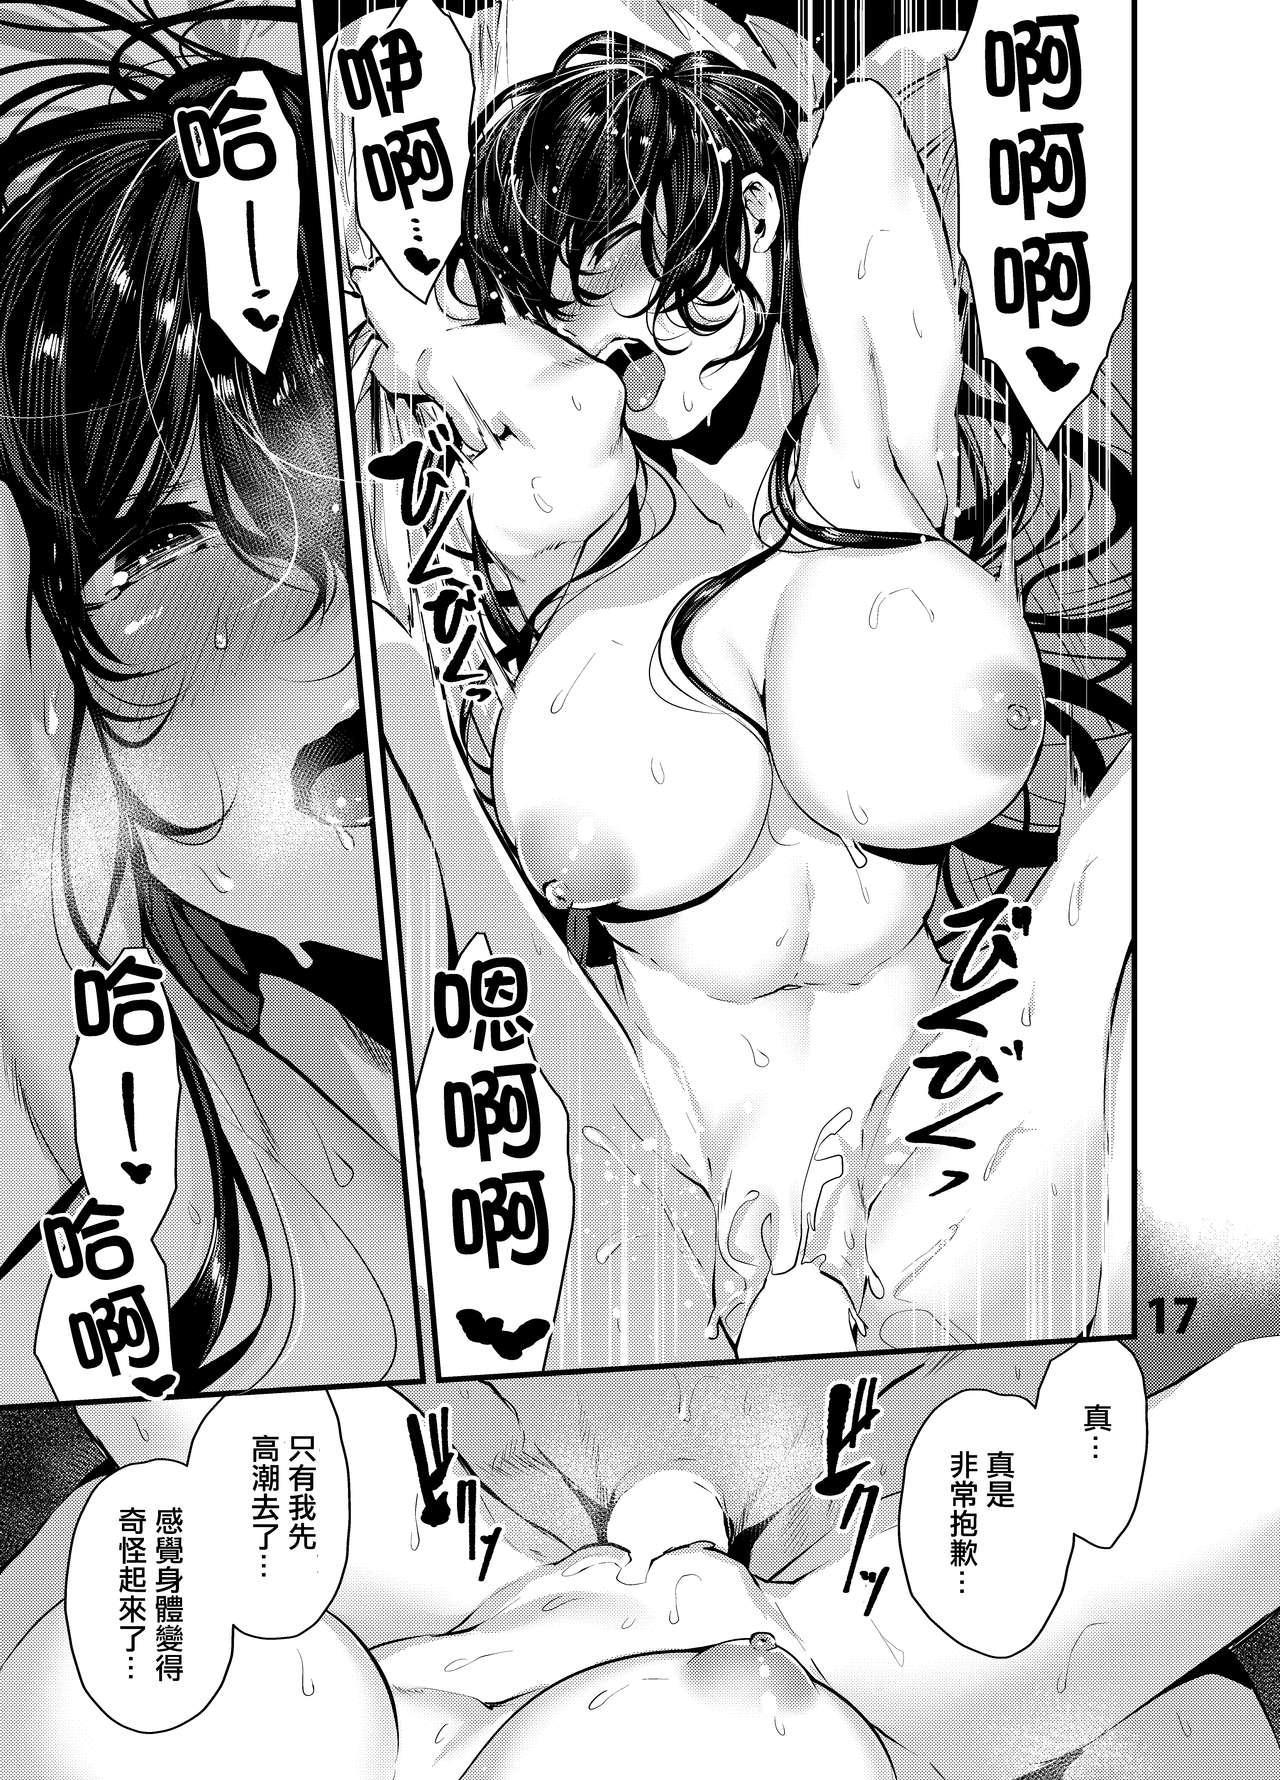 Maguro Maid to Mecha Shikotama Ecchi 15